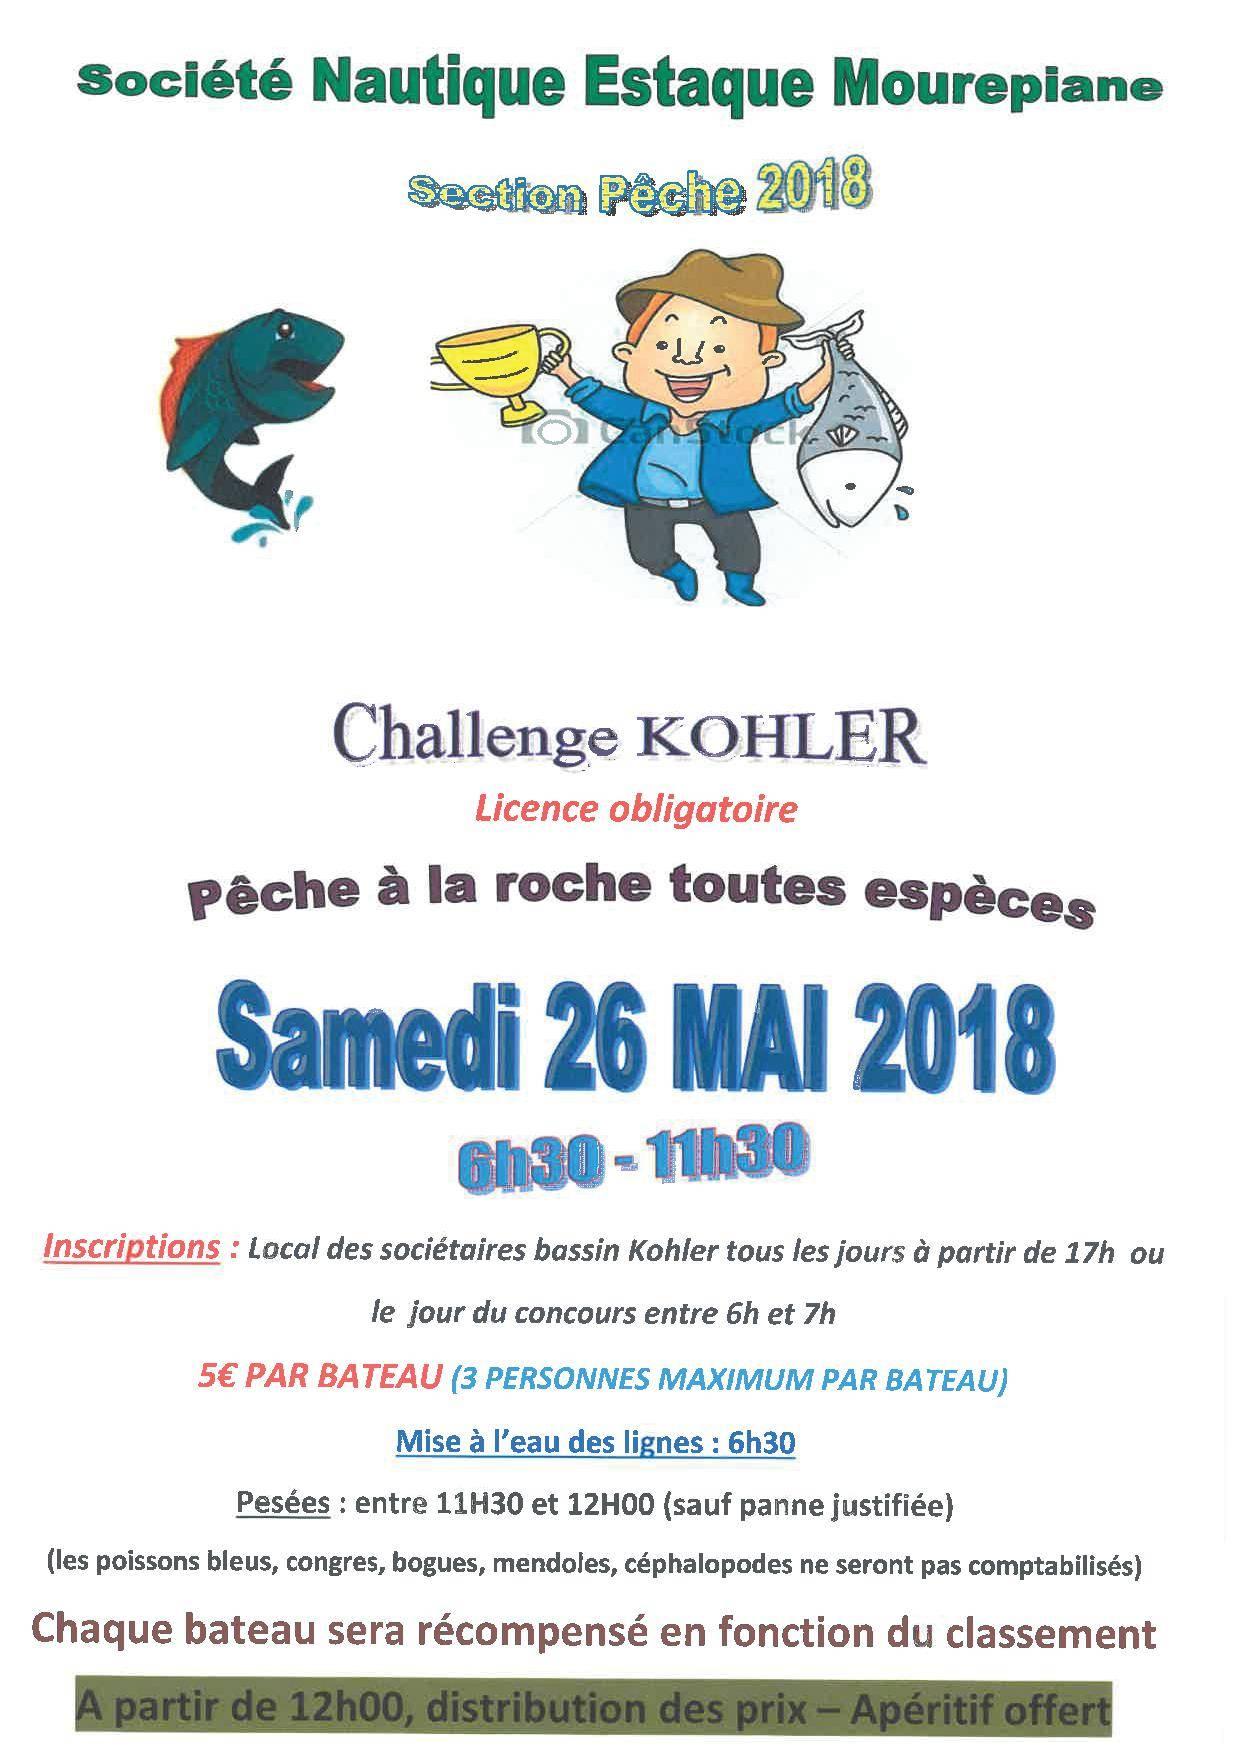 Challenge Kohler samedi 26 mai 2018